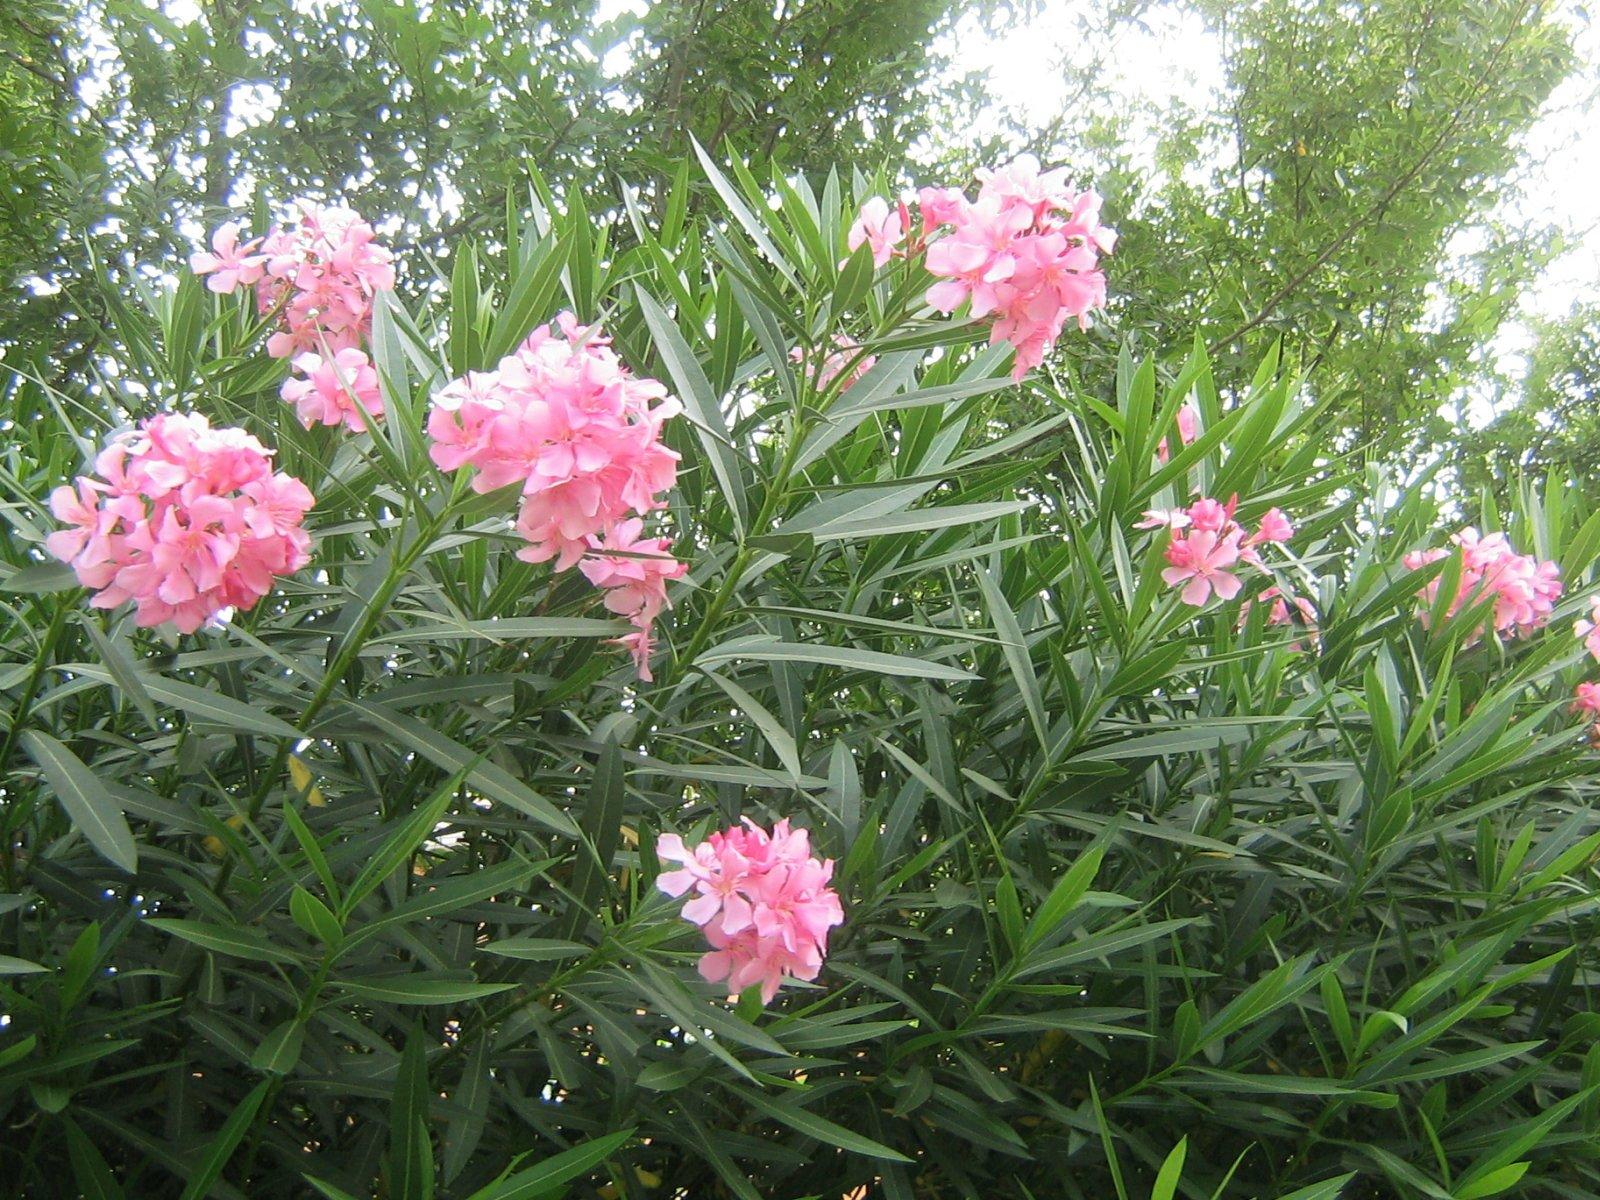 Como naipe cuya baraja se ha perdido las adelfas - Plantas ornamentales venenosas ...